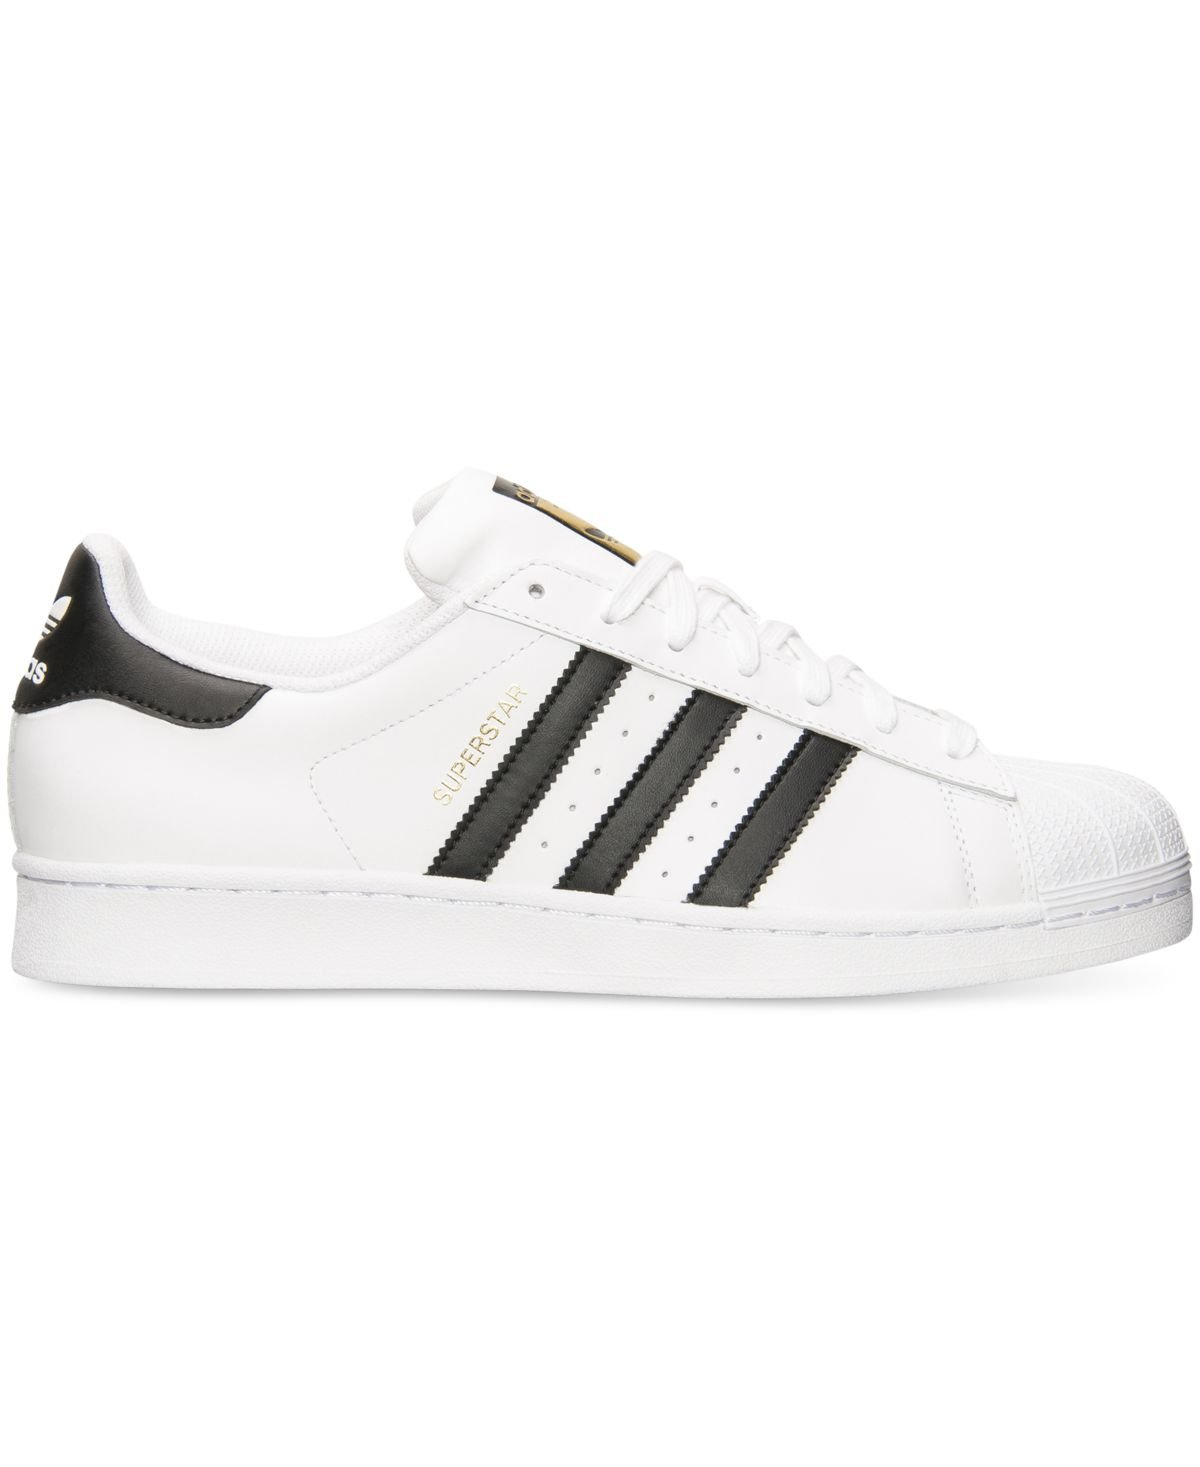 adidas Originals Men's Superstar Casual Sneaker, White/Core Black/White, 9.5 M US by adidas Originals (Image #2)